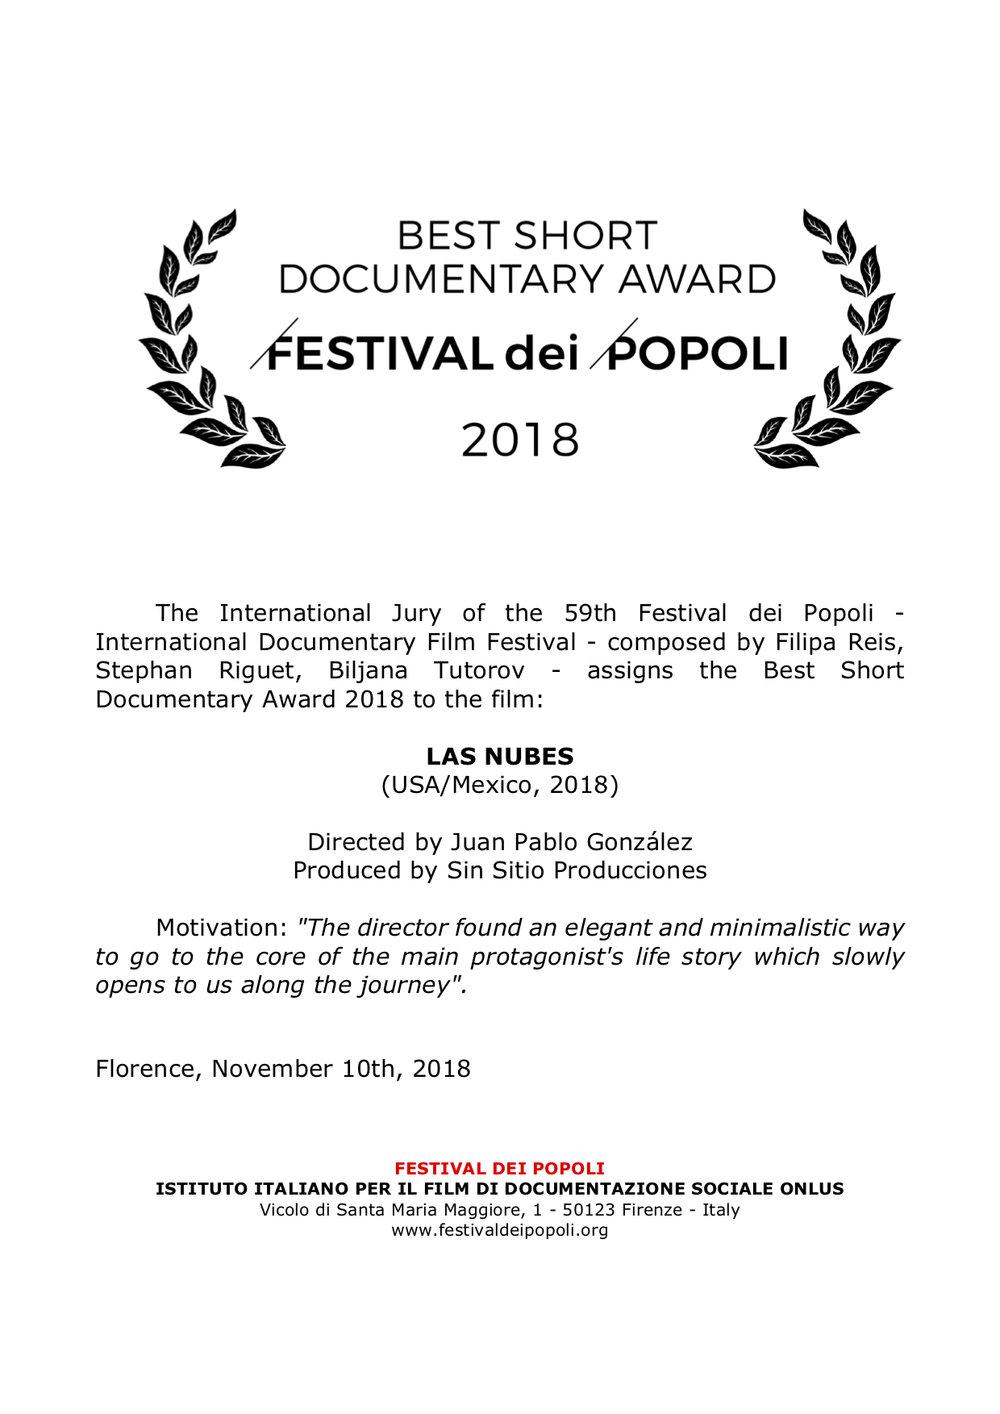 Best Short Documentary Award to LAS NUBES.jpg